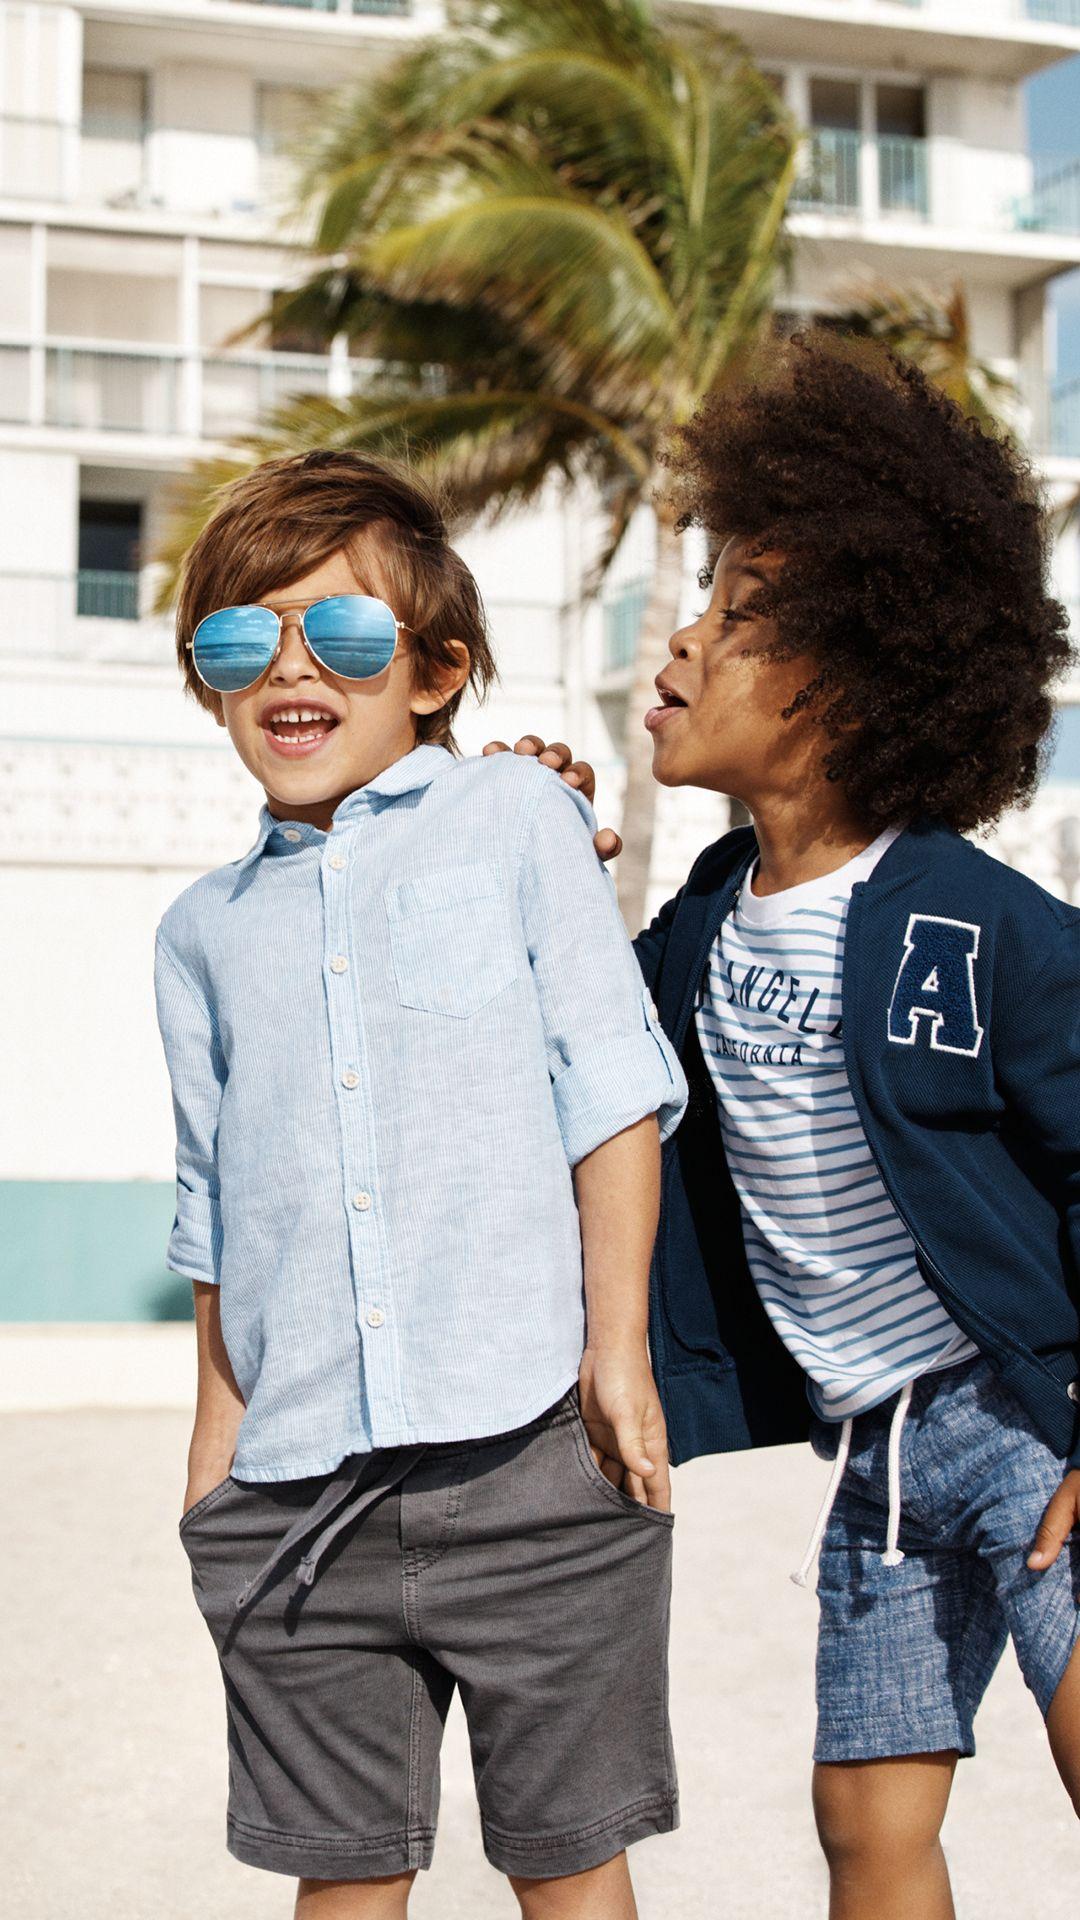 kids embrace bru buy - HD1080×1920